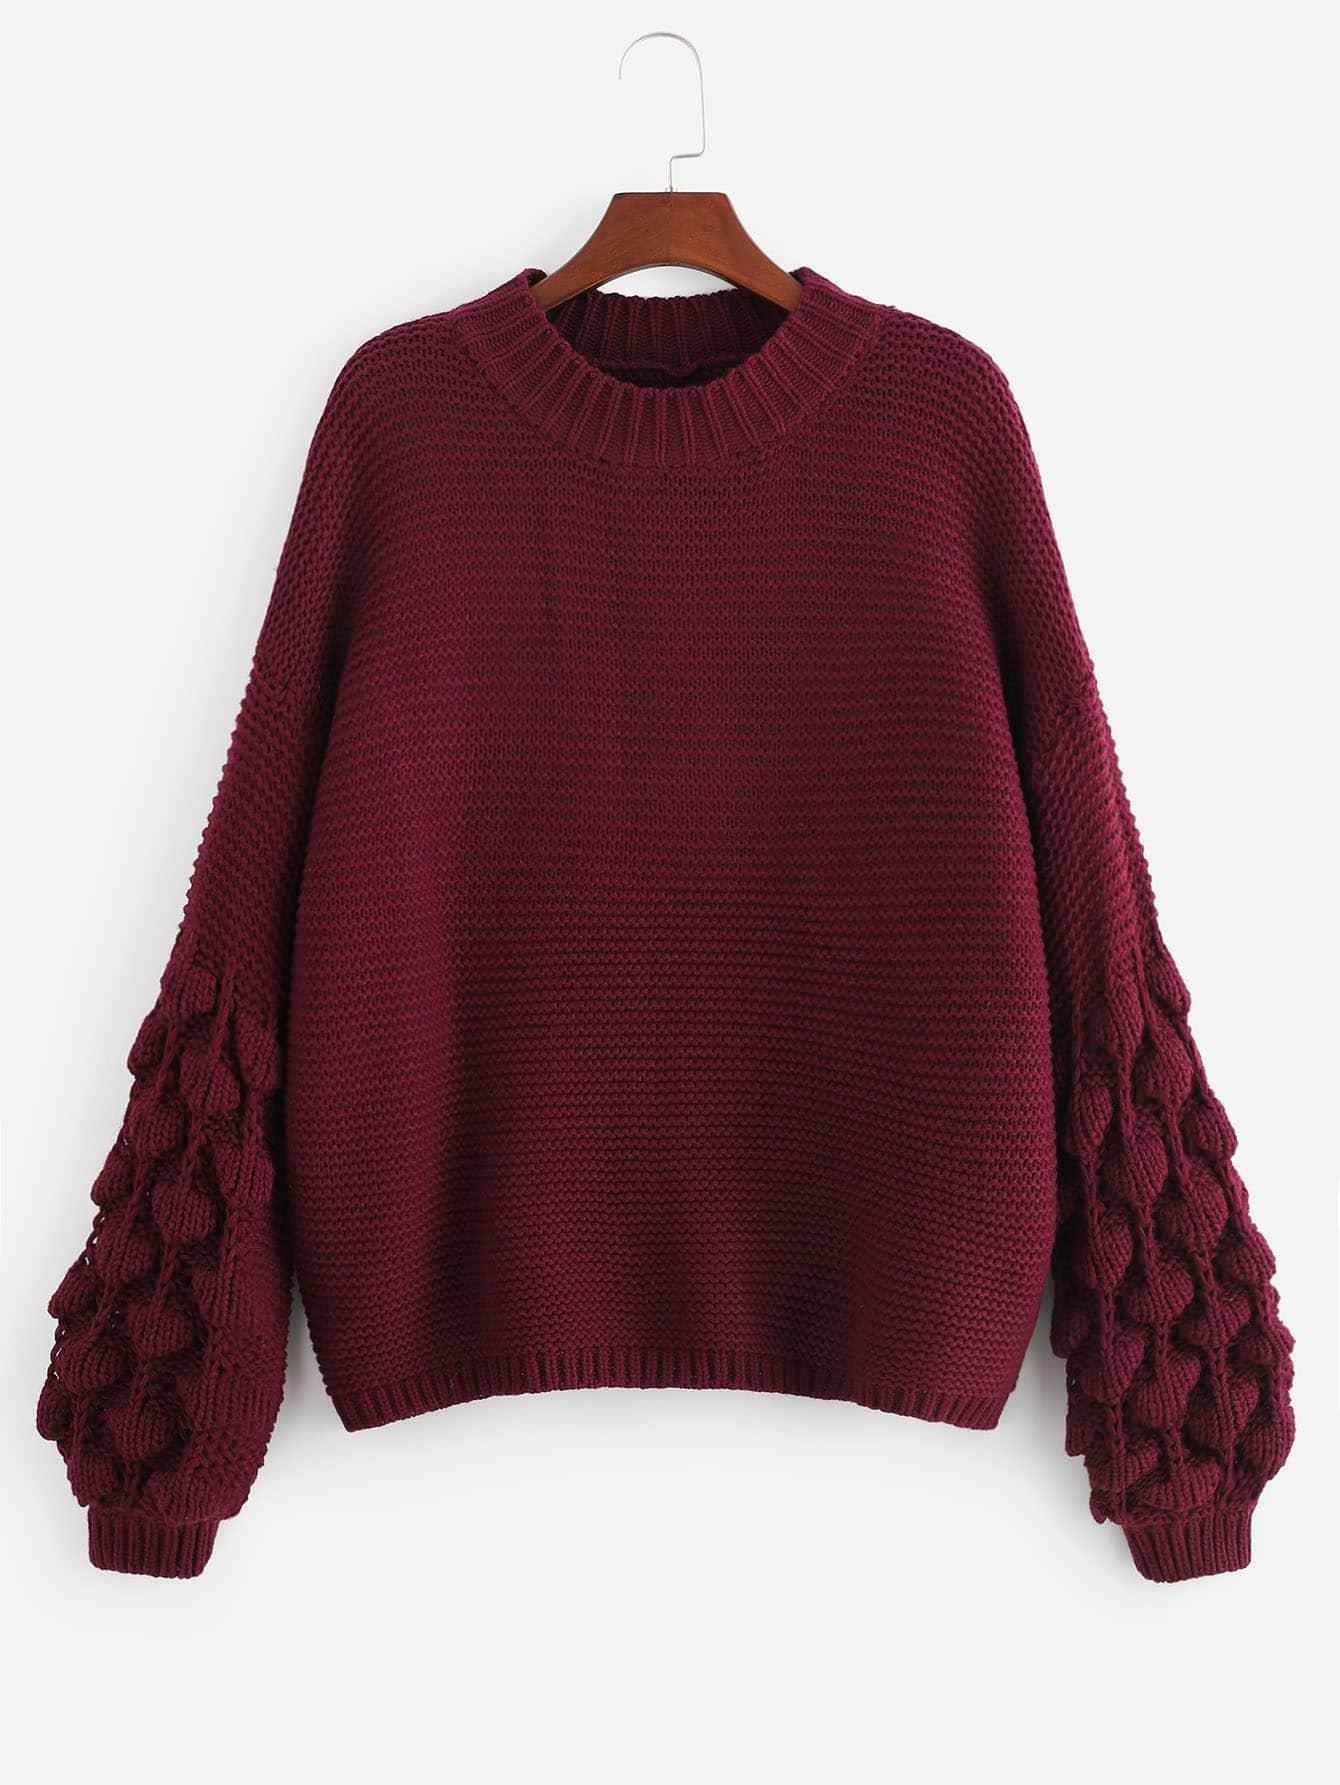 Фото - Размера плюс однотонный свитер с рукав-фонариками от SheIn цвет бургундия